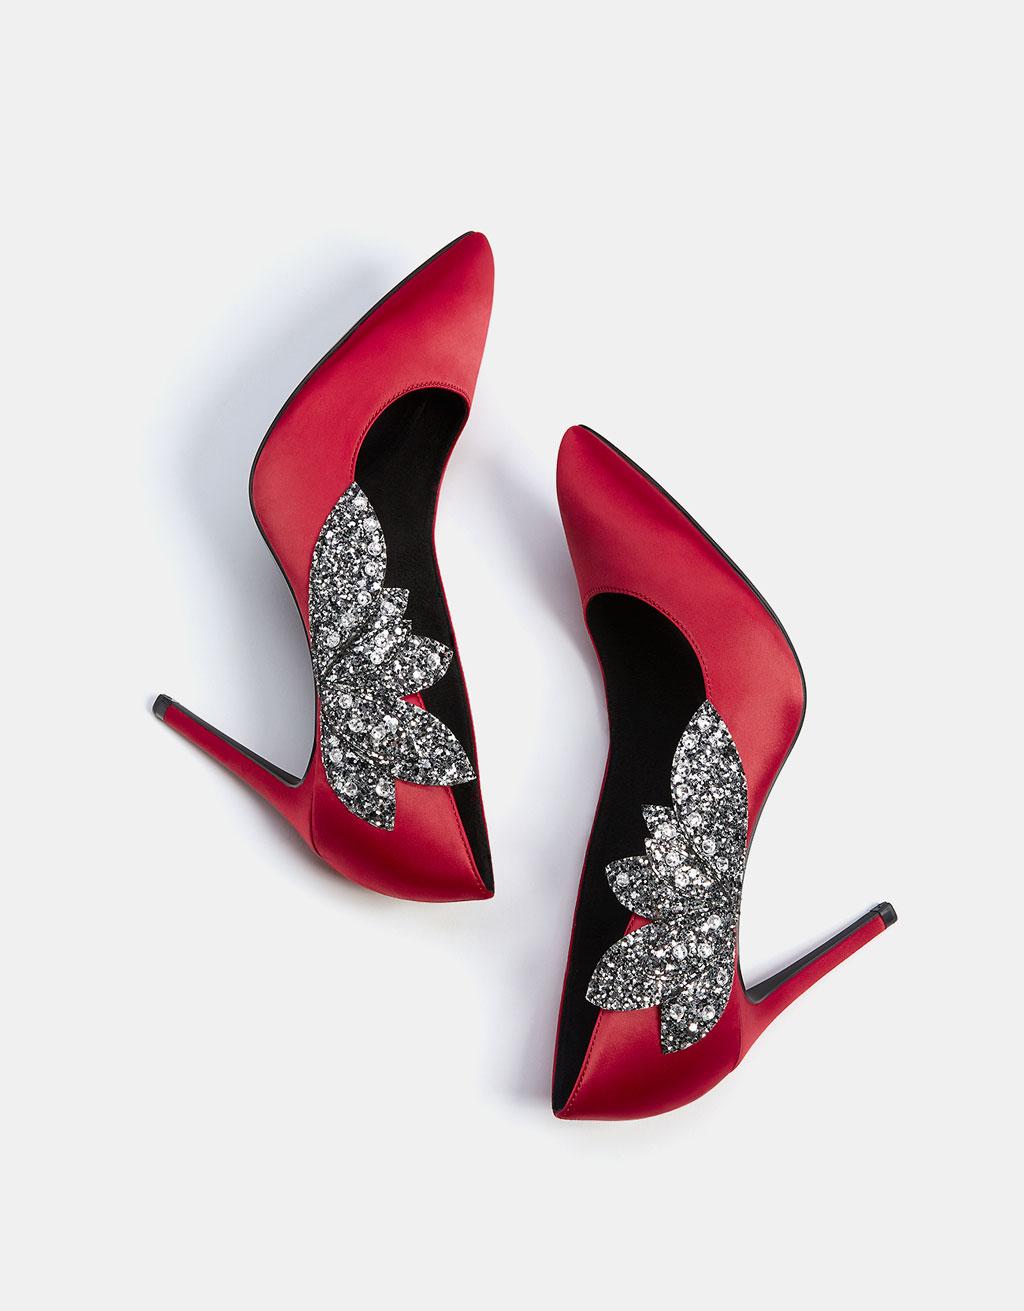 Satin stiletto heel shoes with gem details